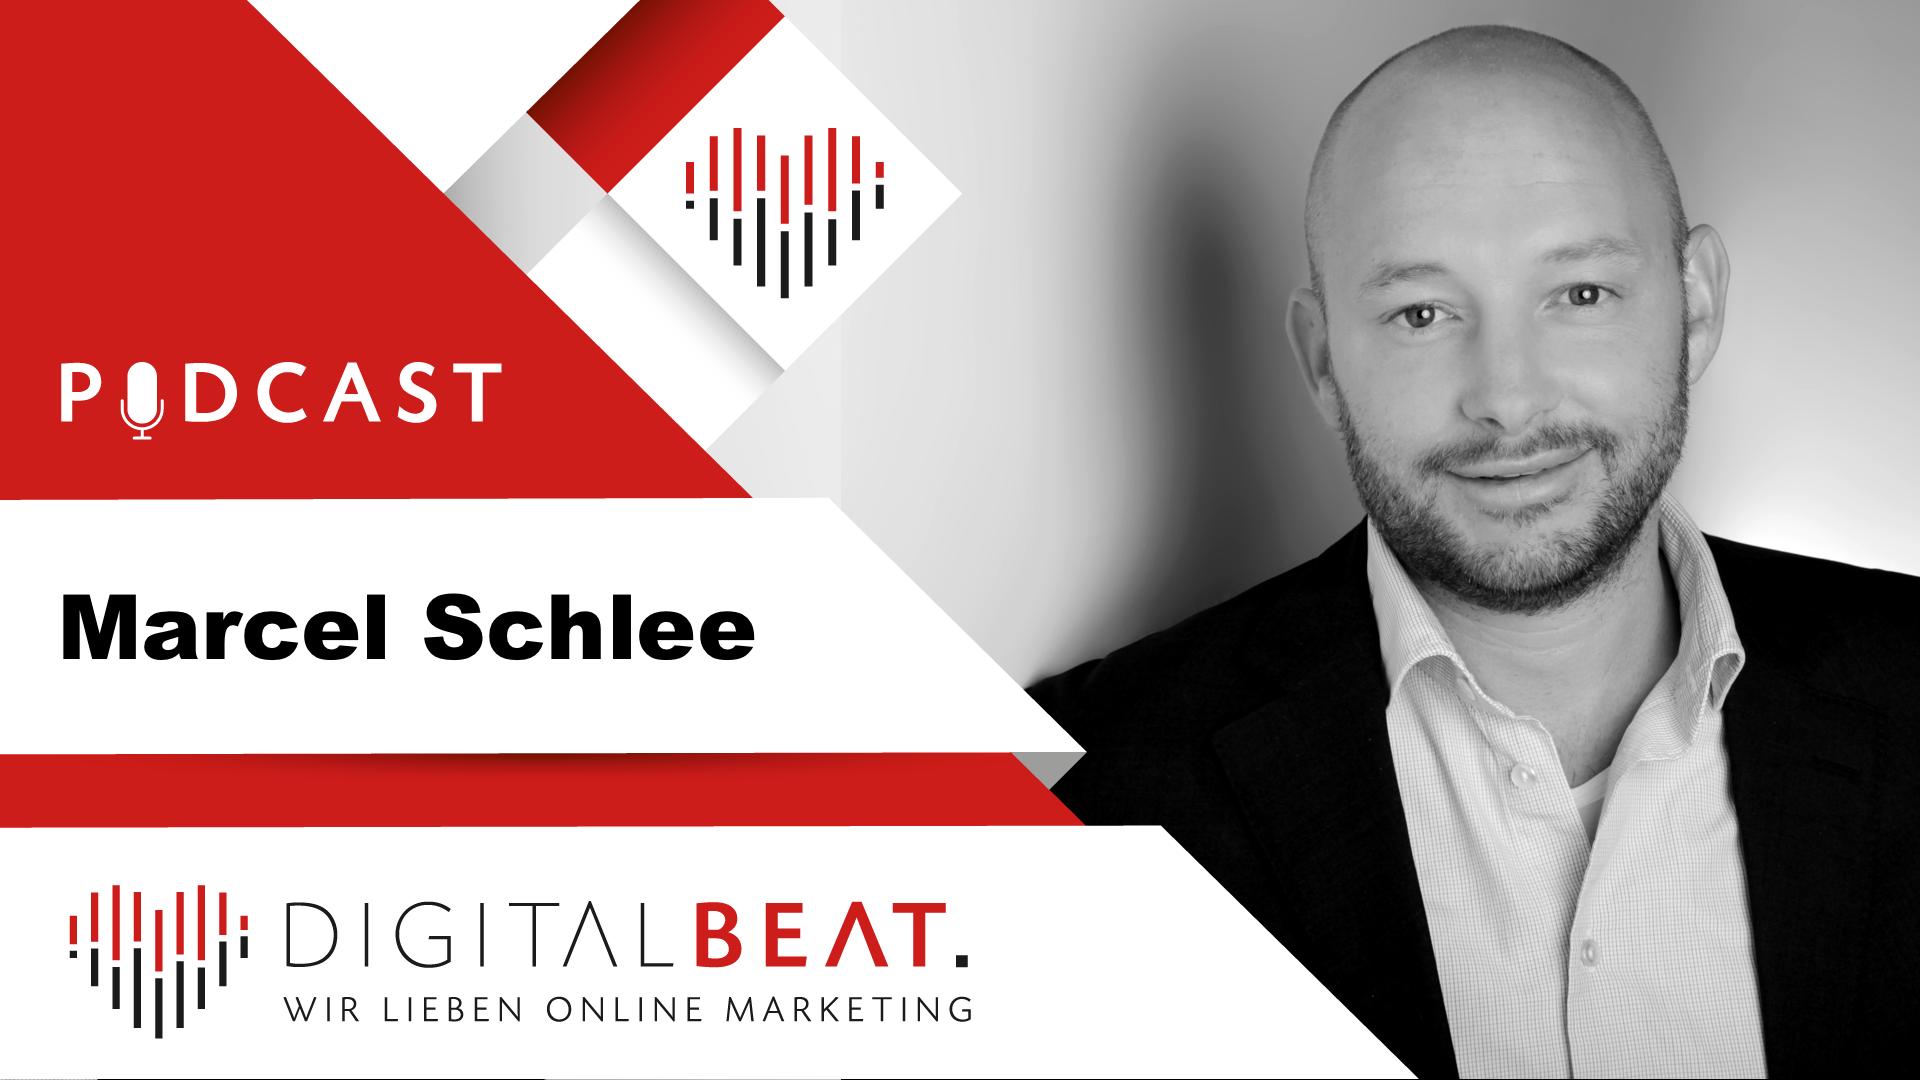 Podcast Marcel Schlee Digital Beat